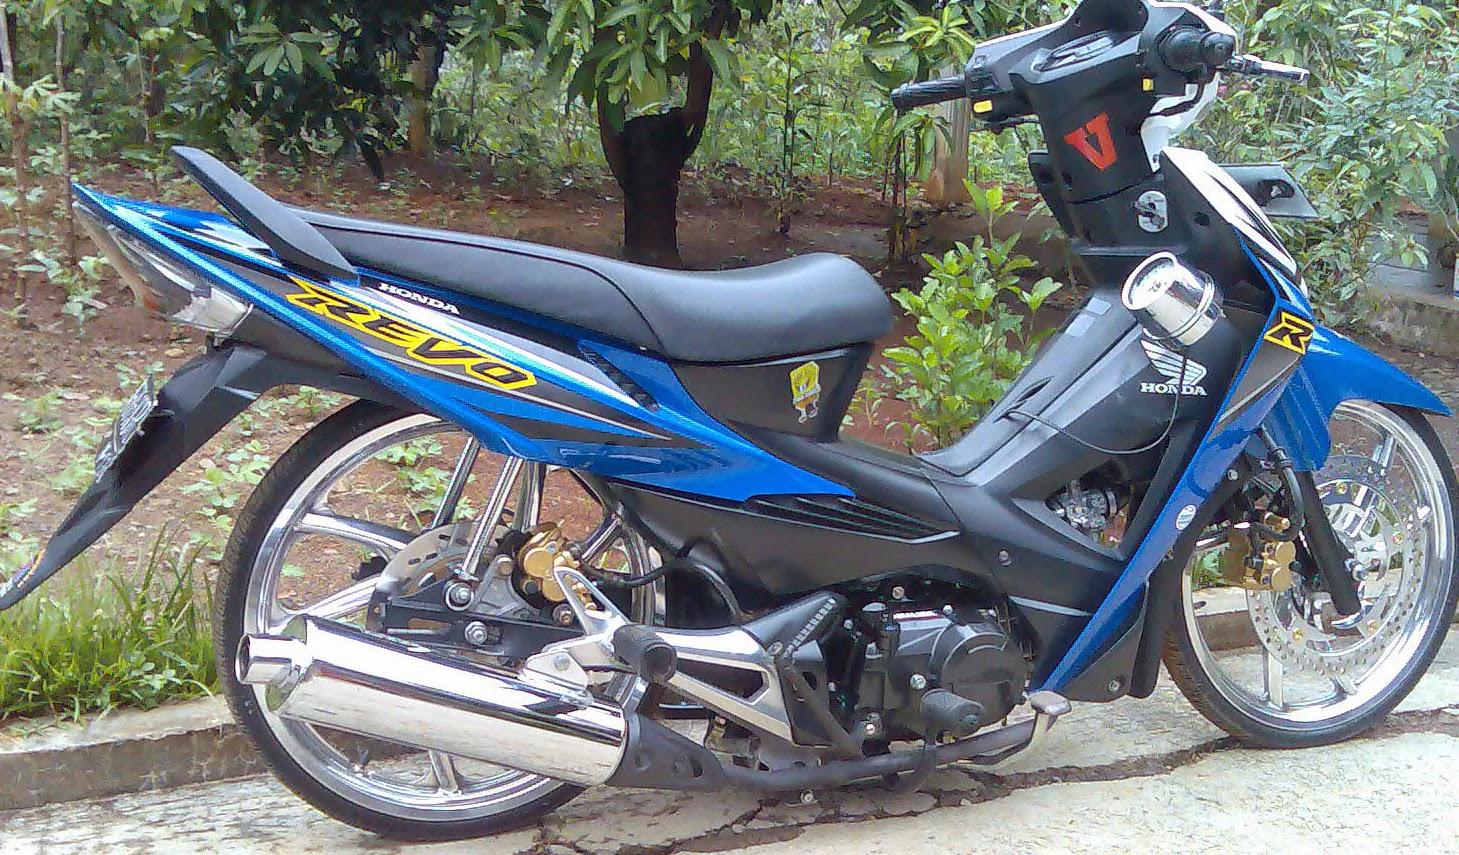 70 Foto Modifikasi Motor Revo Ceper Terkeren Teka Teki Motor